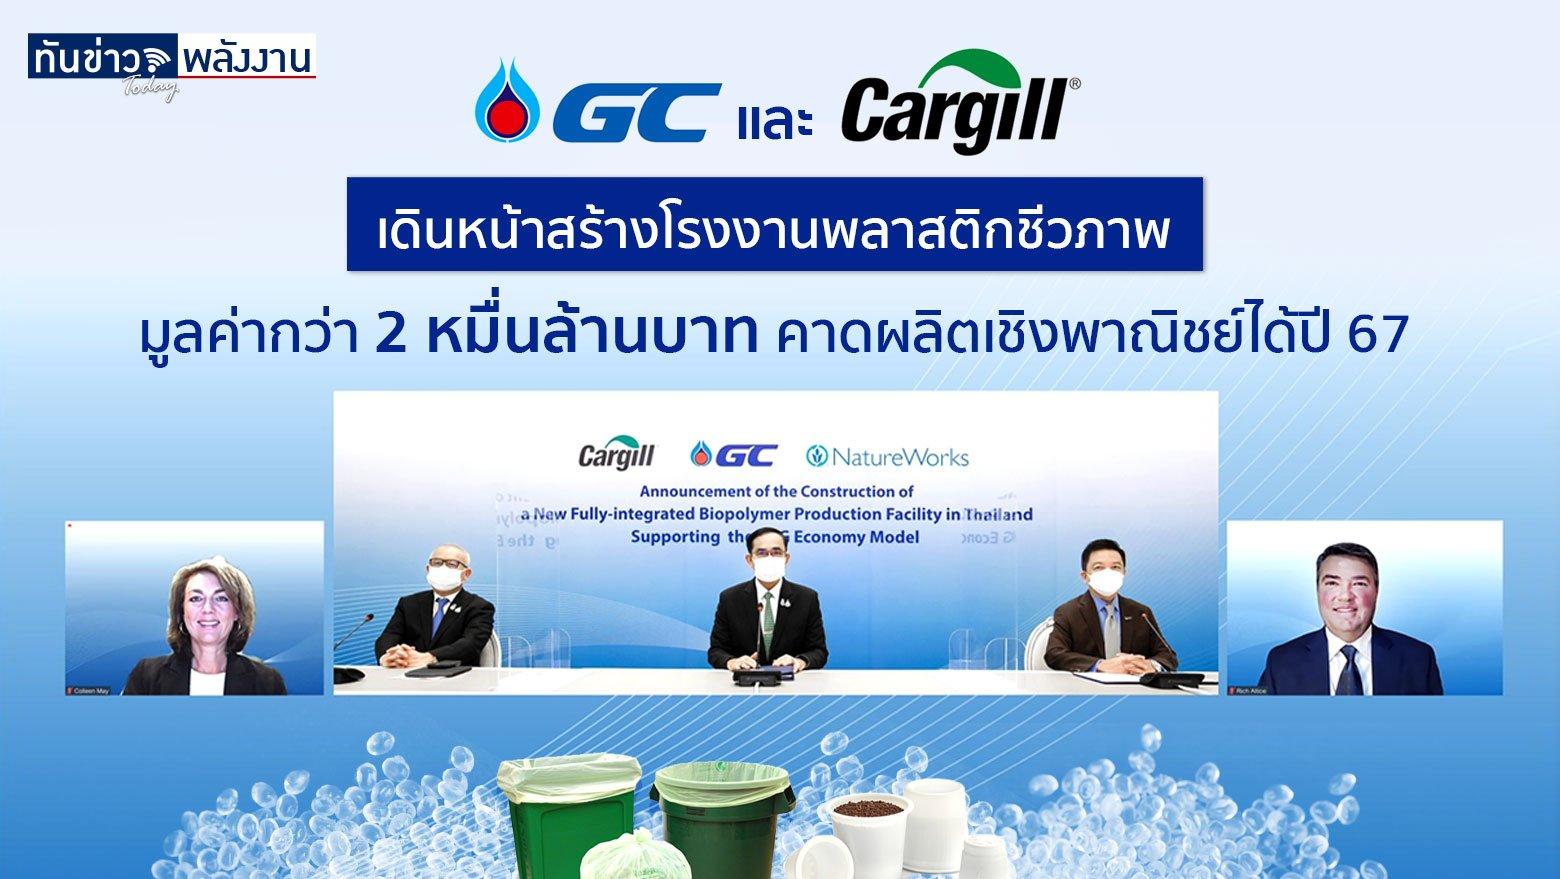 GC และ Cargill เดินหน้าสร้างโรงงานพลาสติกชีวภาพ มูลค่ากว่า 2 หมื่นล้านบาท คาดผลิตเชิงพาณิชย์ได้ปี 67